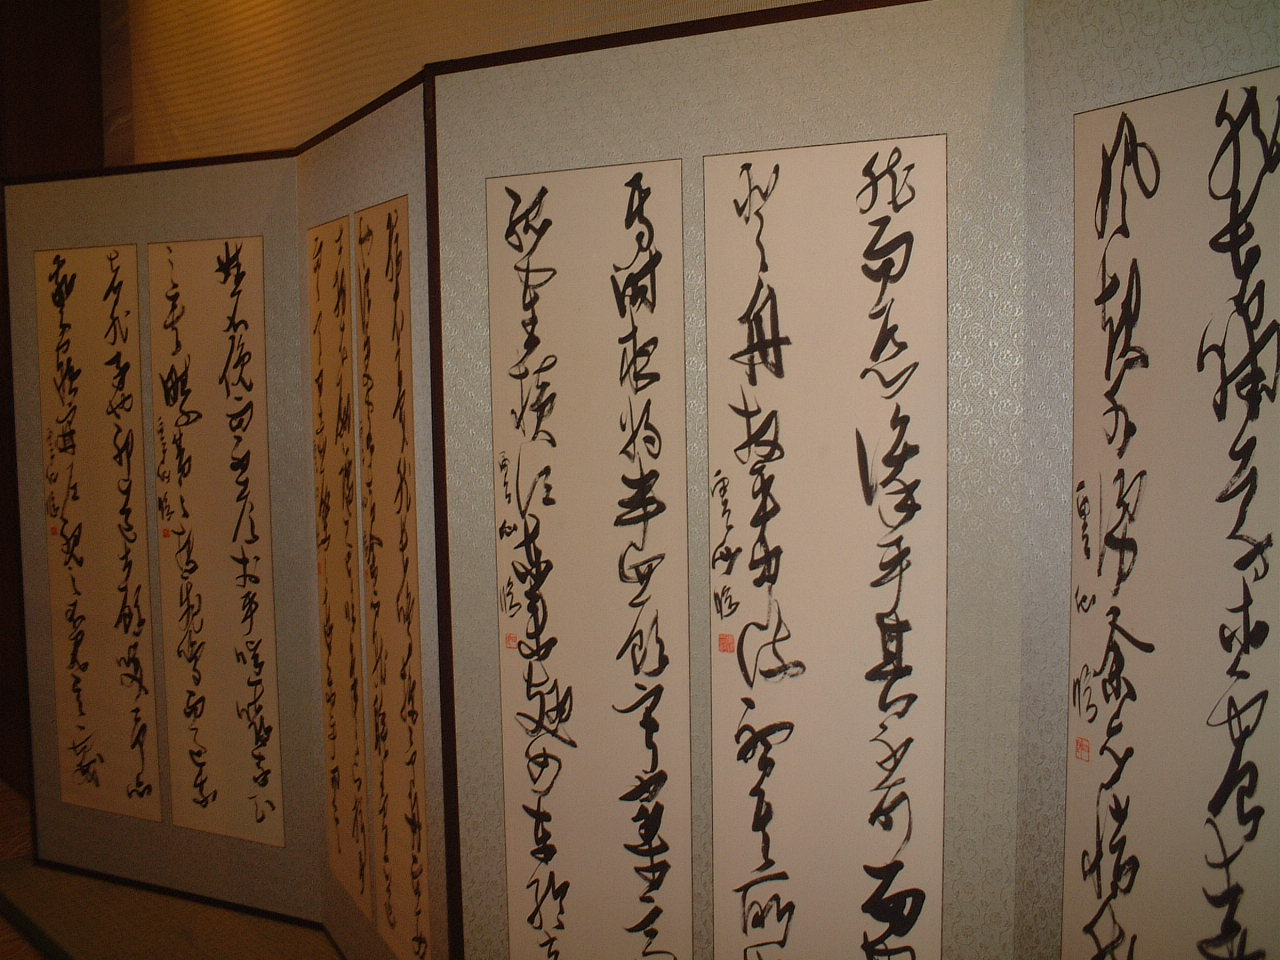 廣津雲仙生誕100年展: sakuraenw...